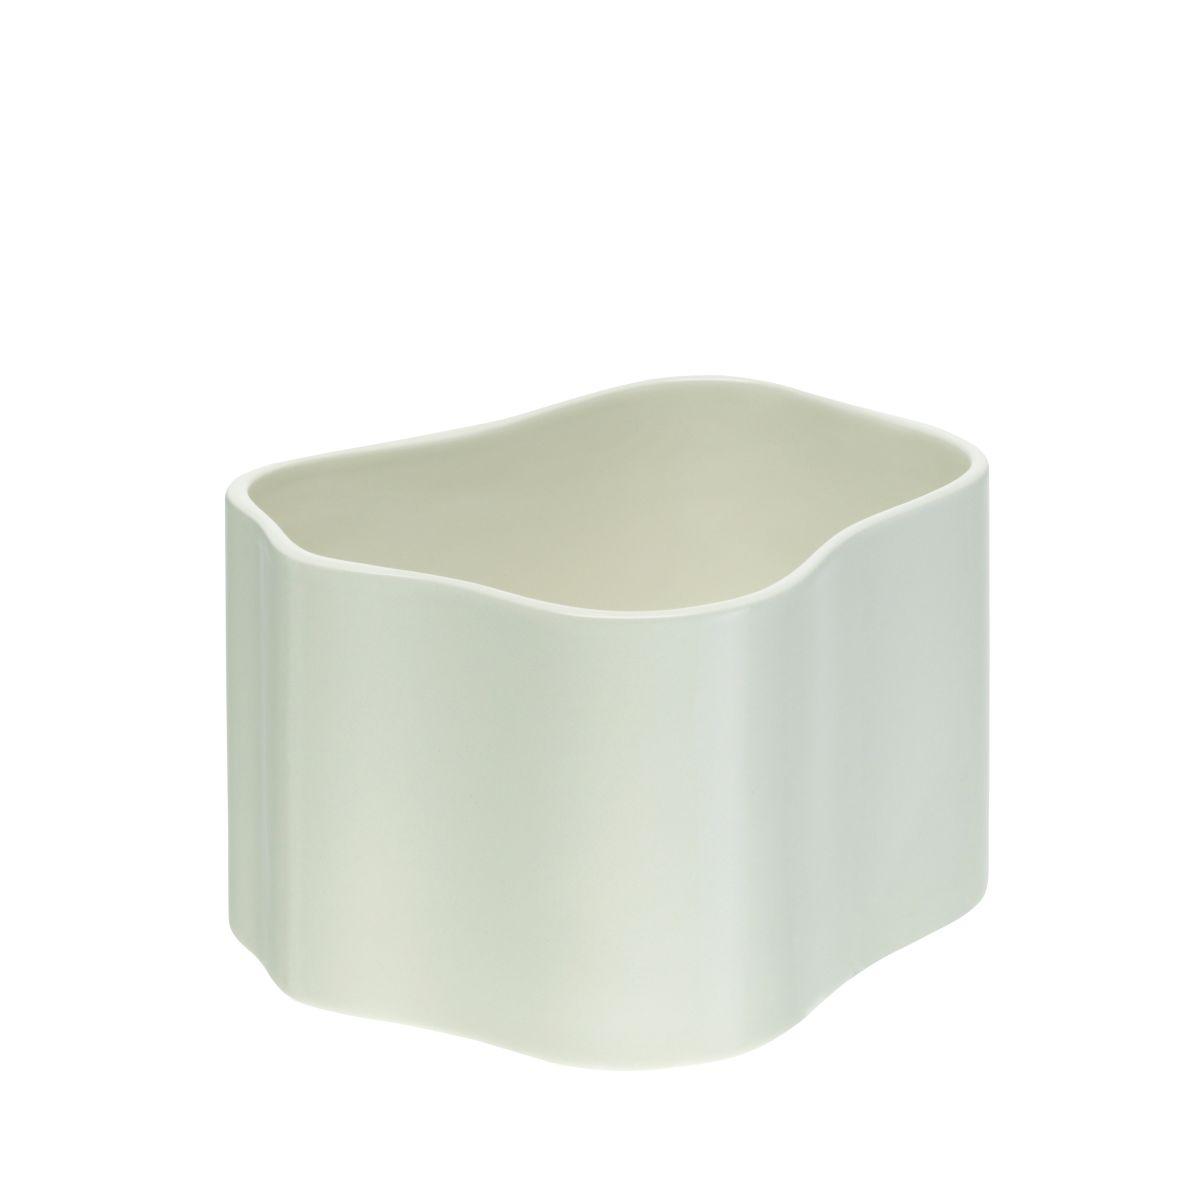 Plant-Pot-Shape-B-Size-S-White-Gloss_F